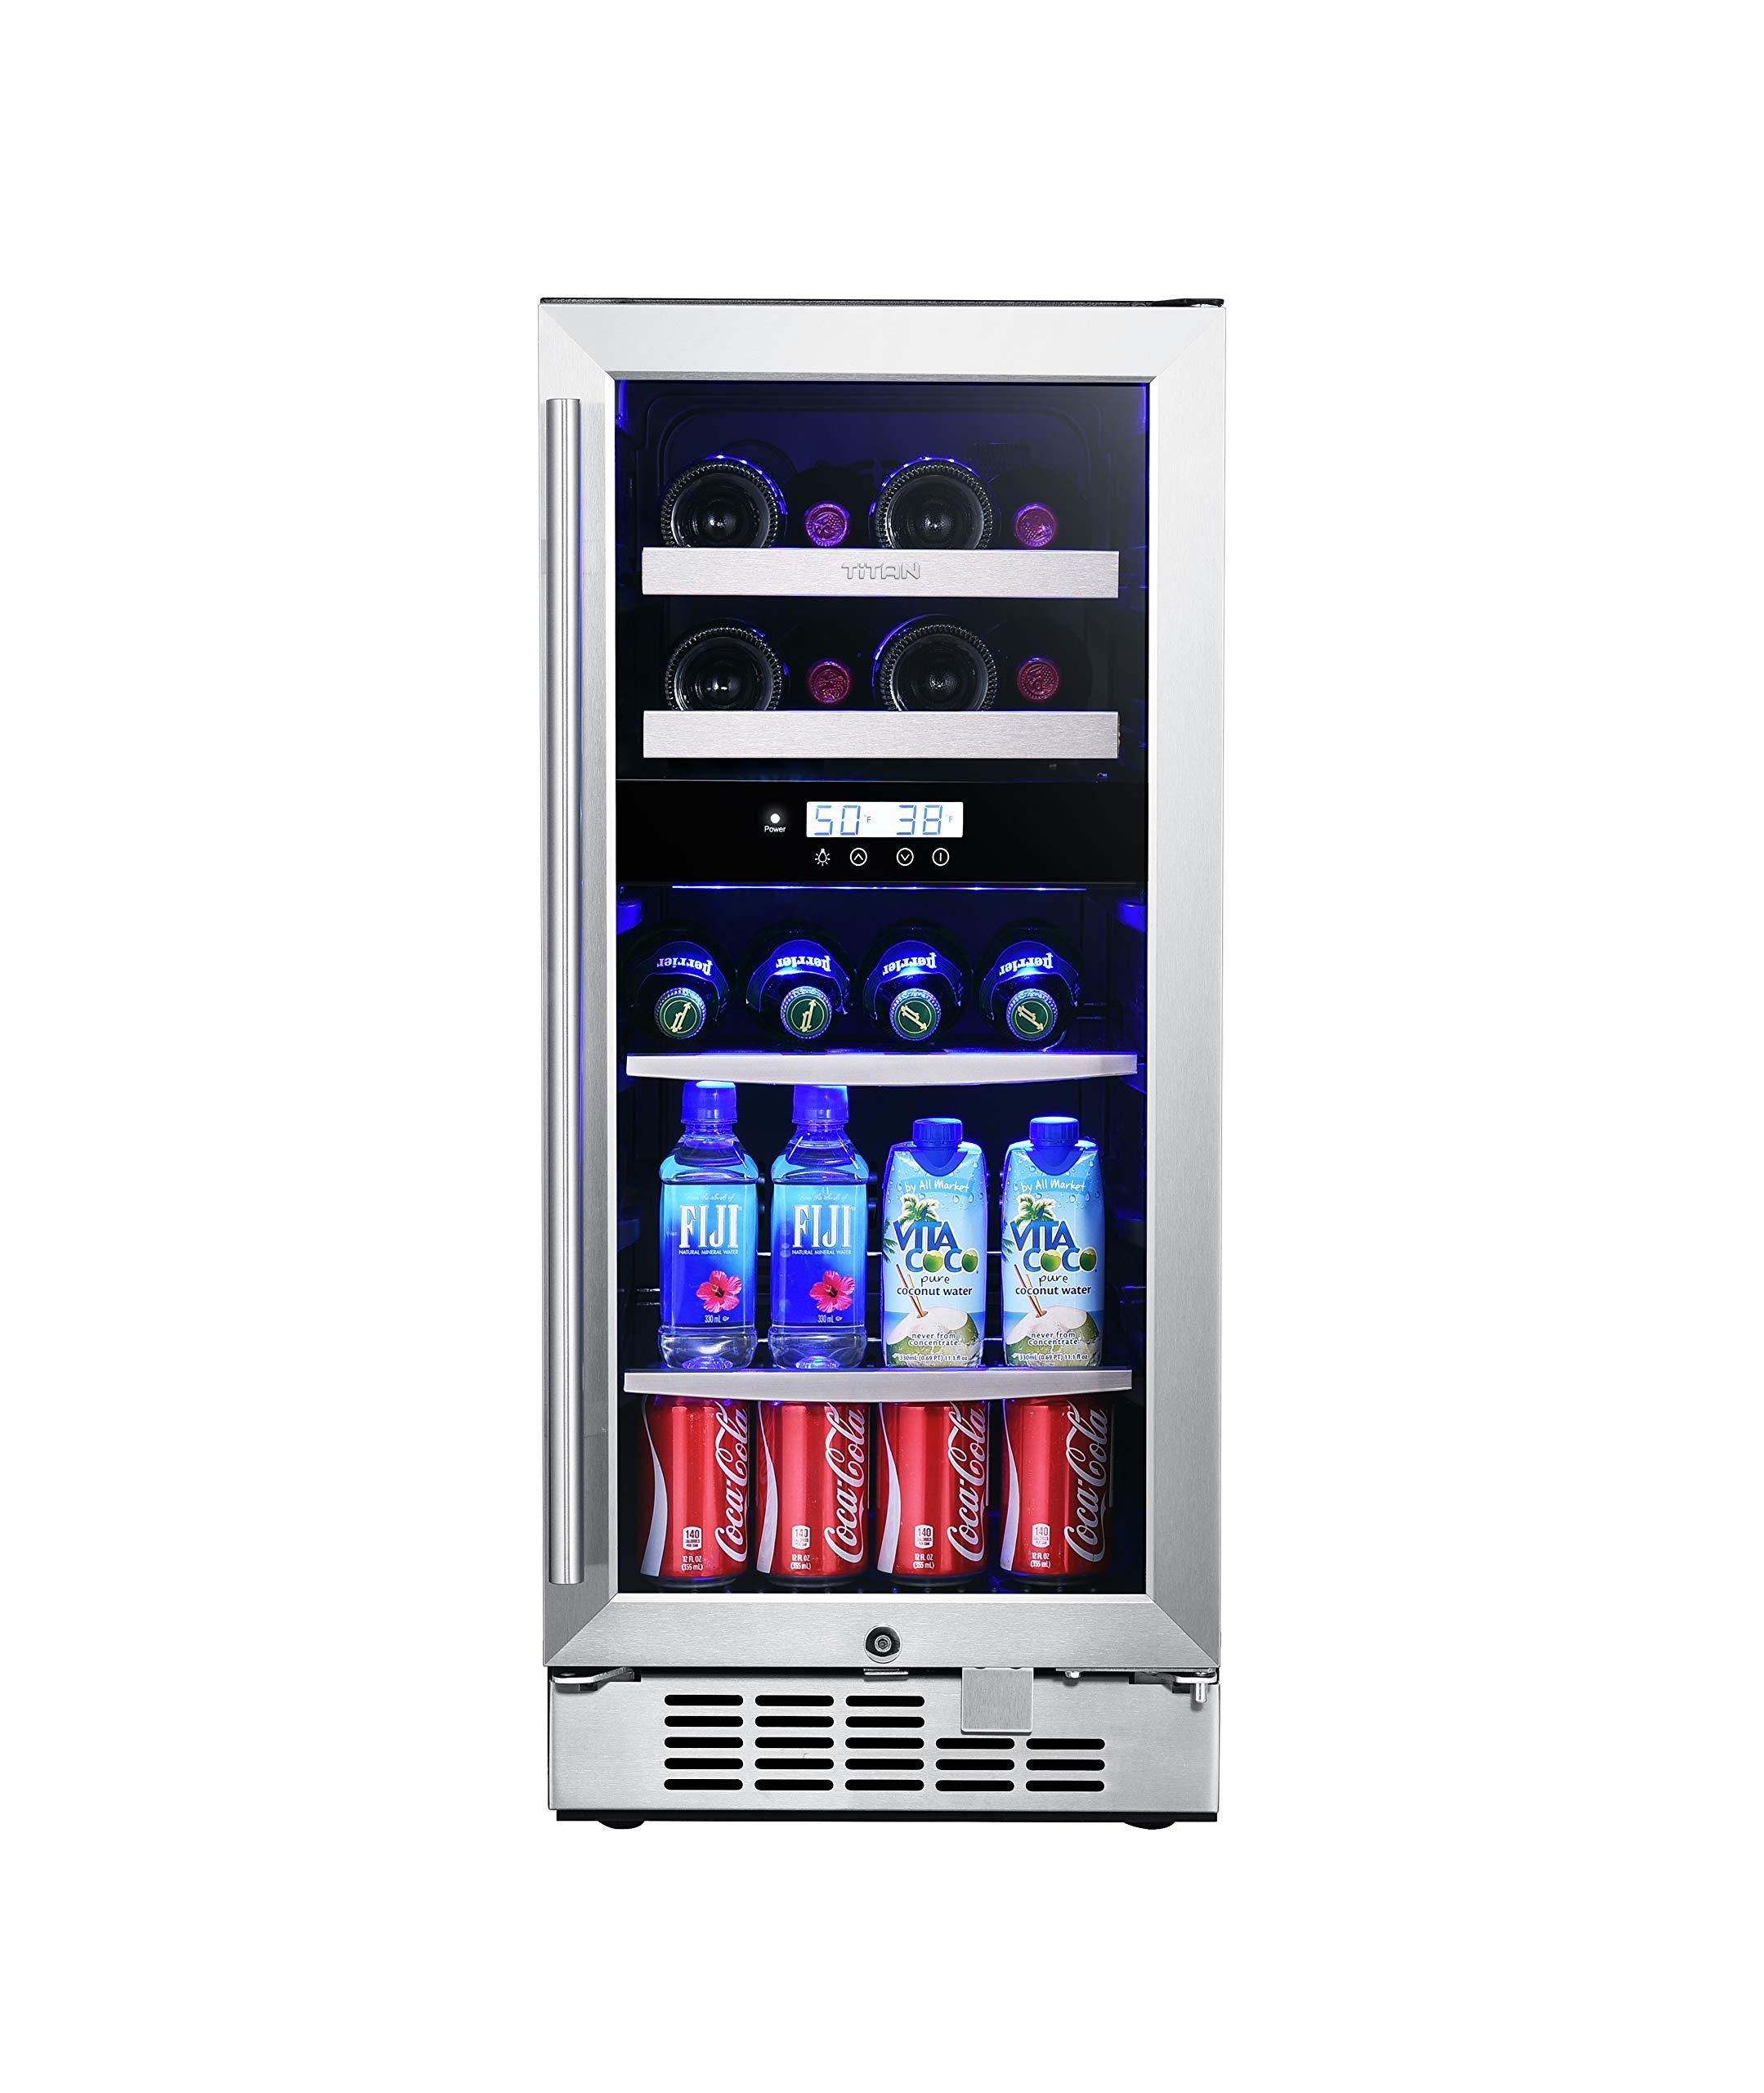 Titan Signature 15 inch 8-bottle and 44-can Built in Dual Zone Wine and Beverage Cooler, Wine Shelf and Adjustable Glass Shelf, Stainless Steel Door, Temp Memory Function, Door Open Alarm